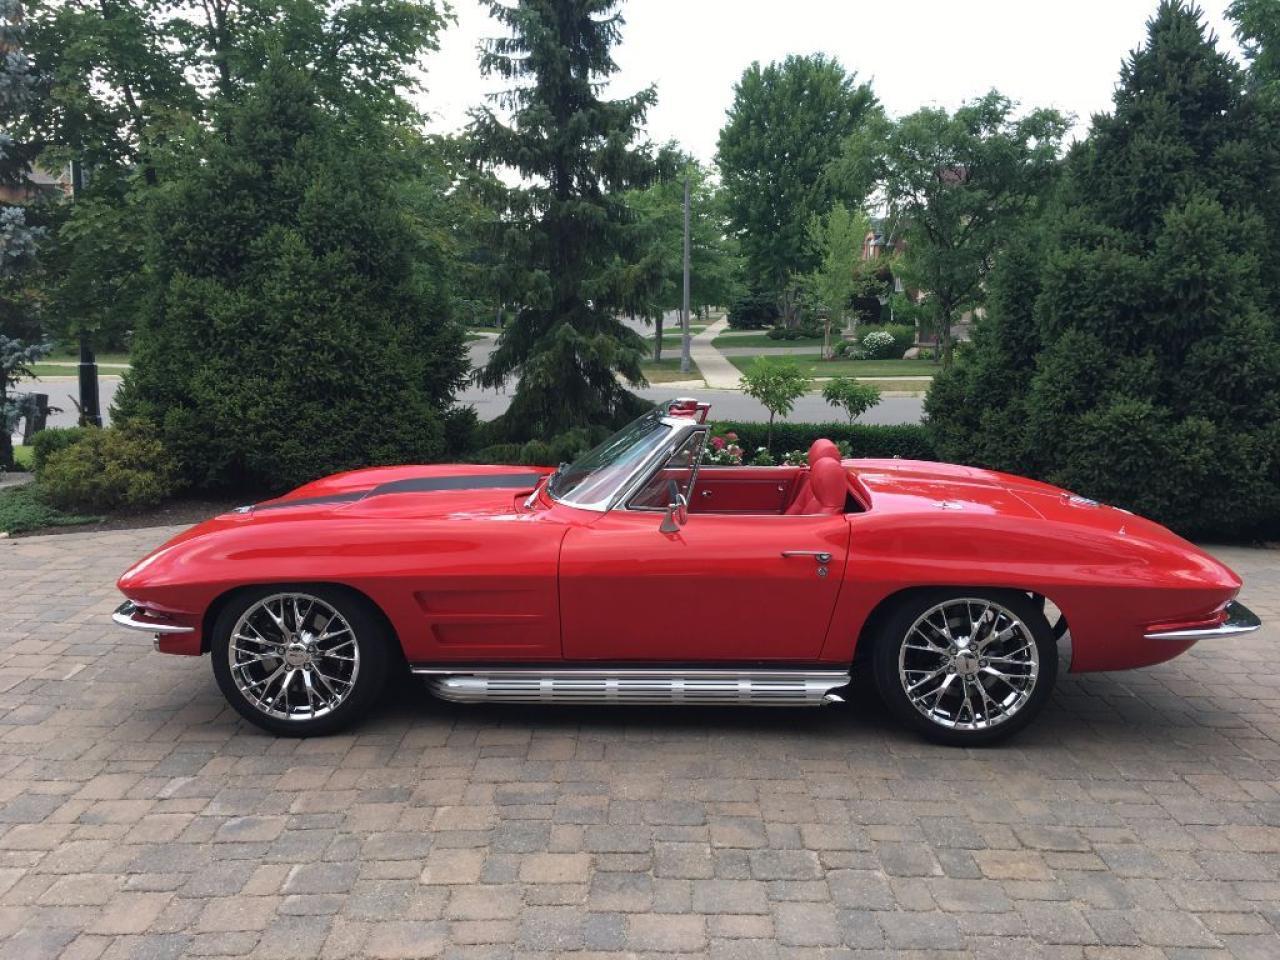 Photo of Red 1964 Chevrolet Corvette RESTOMOD PRO-TOURING STINGRAY